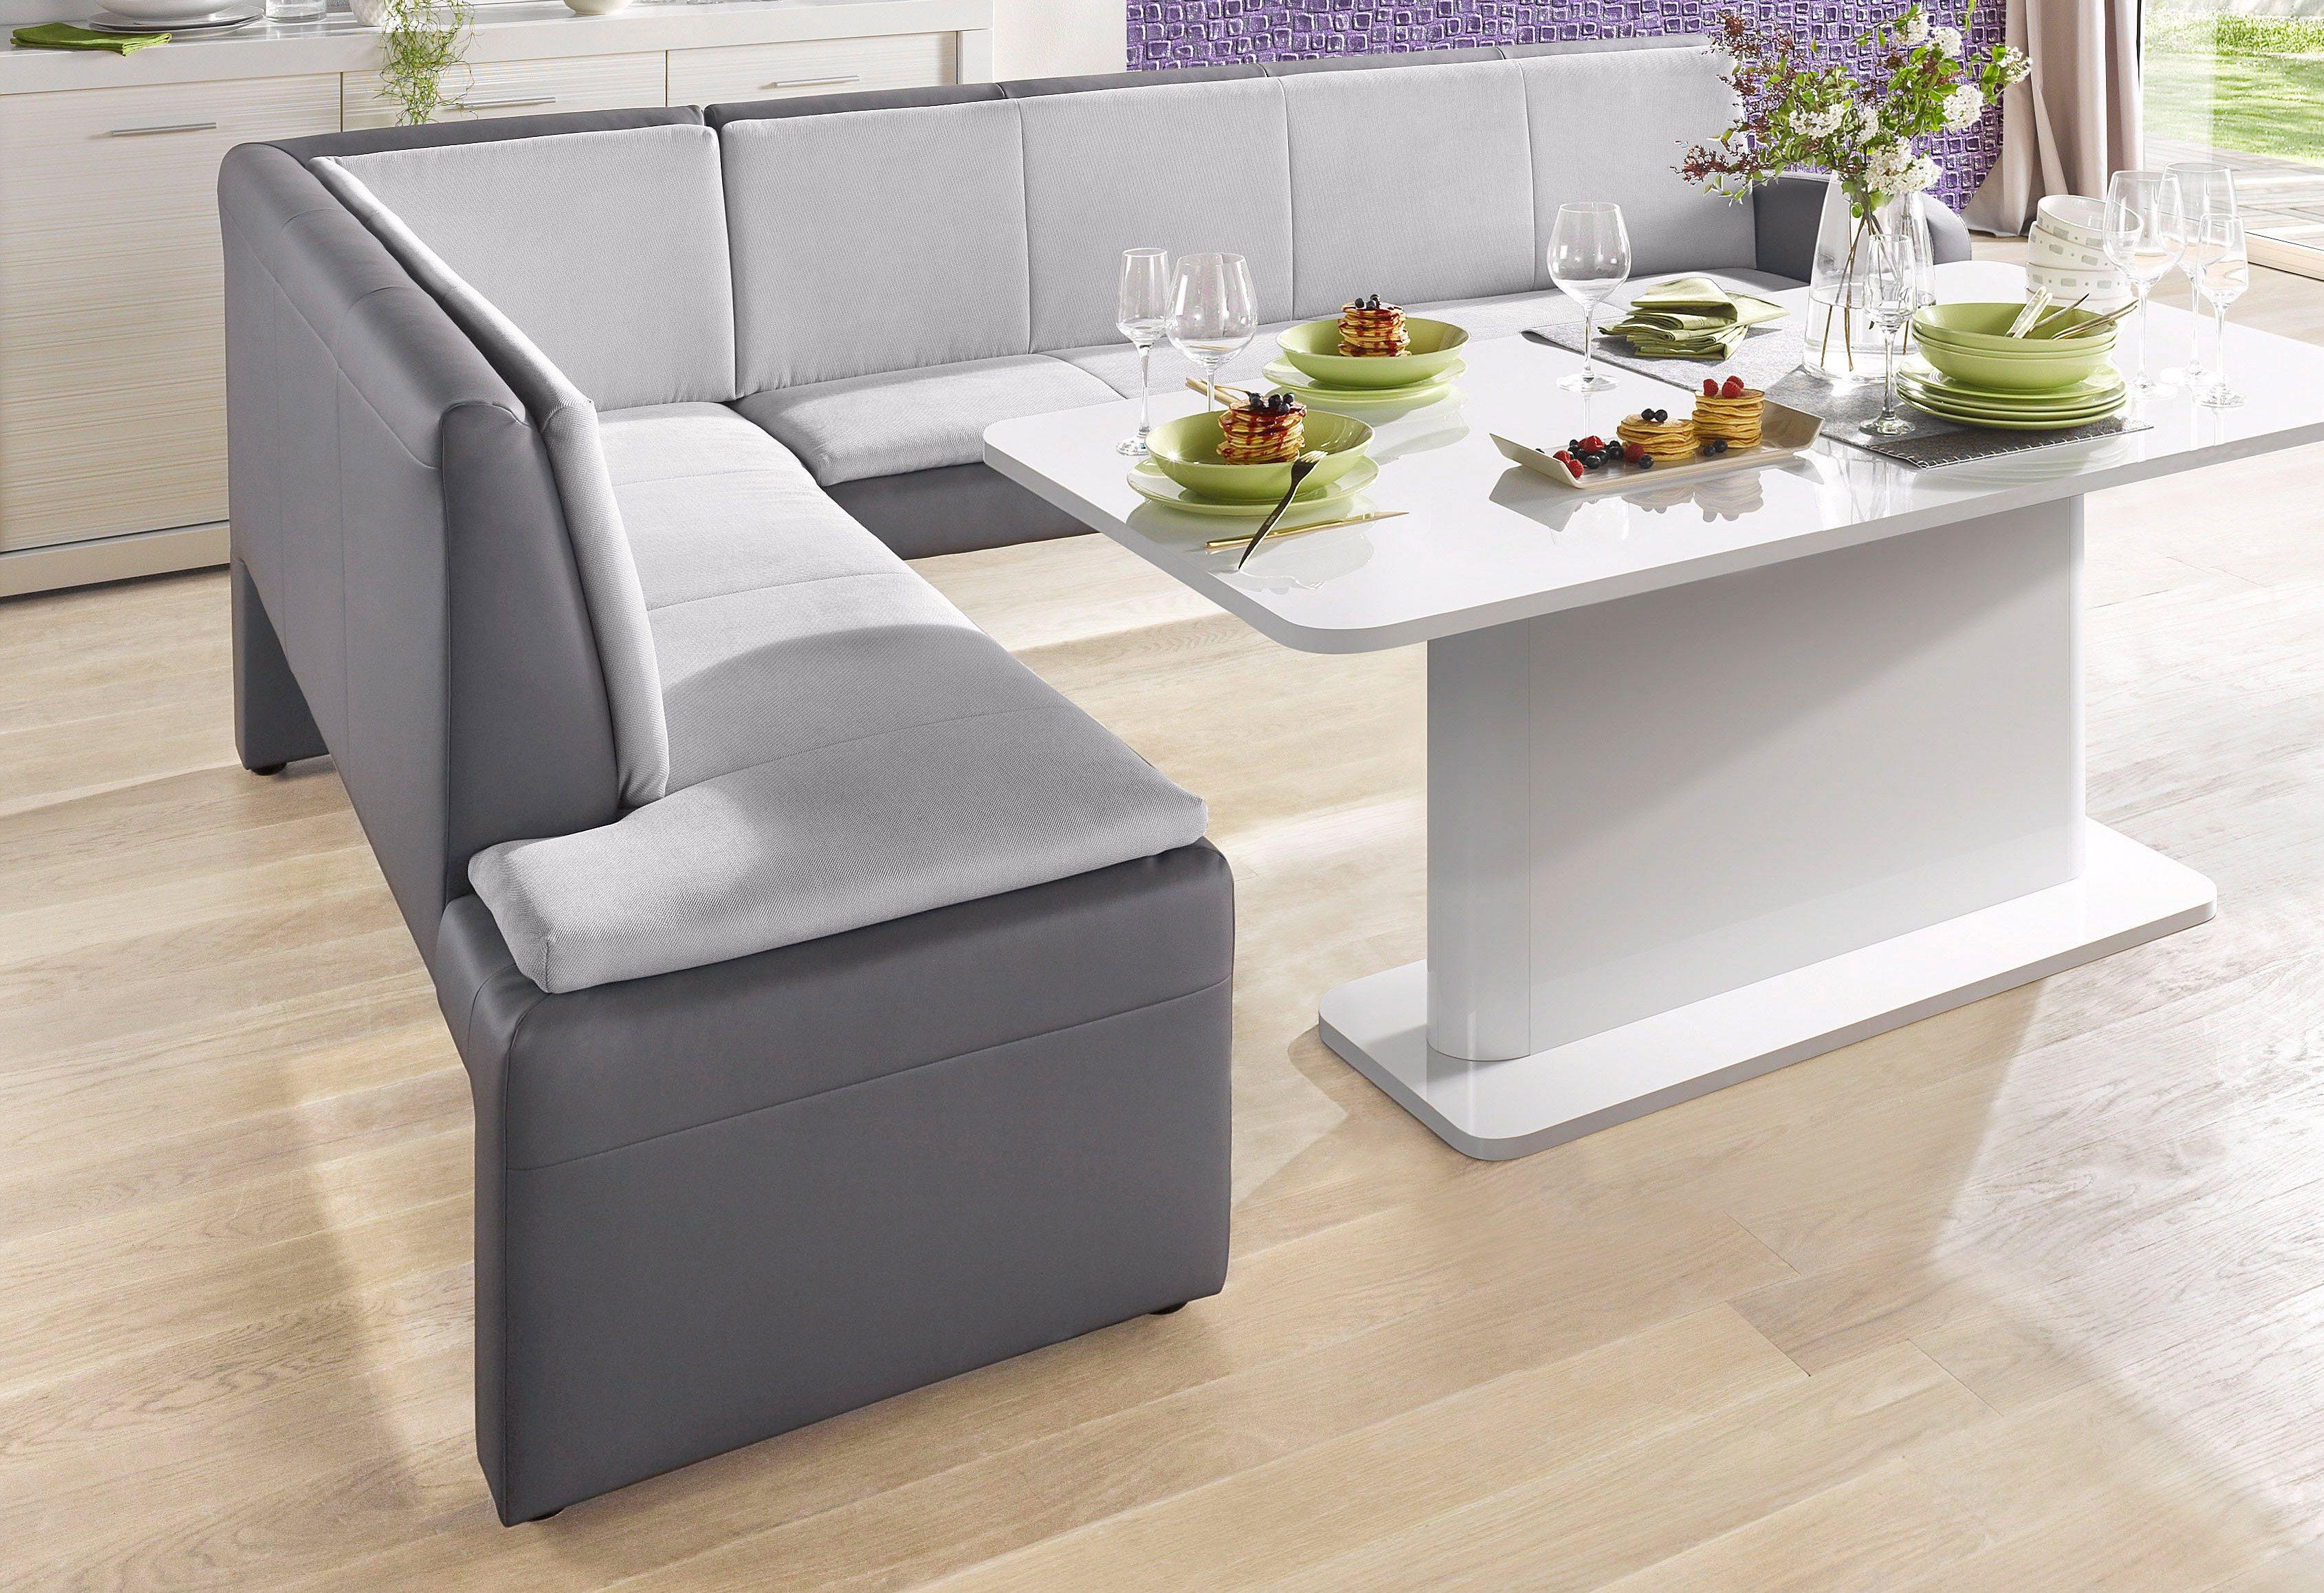 classico eckb nke online kaufen m bel suchmaschine. Black Bedroom Furniture Sets. Home Design Ideas